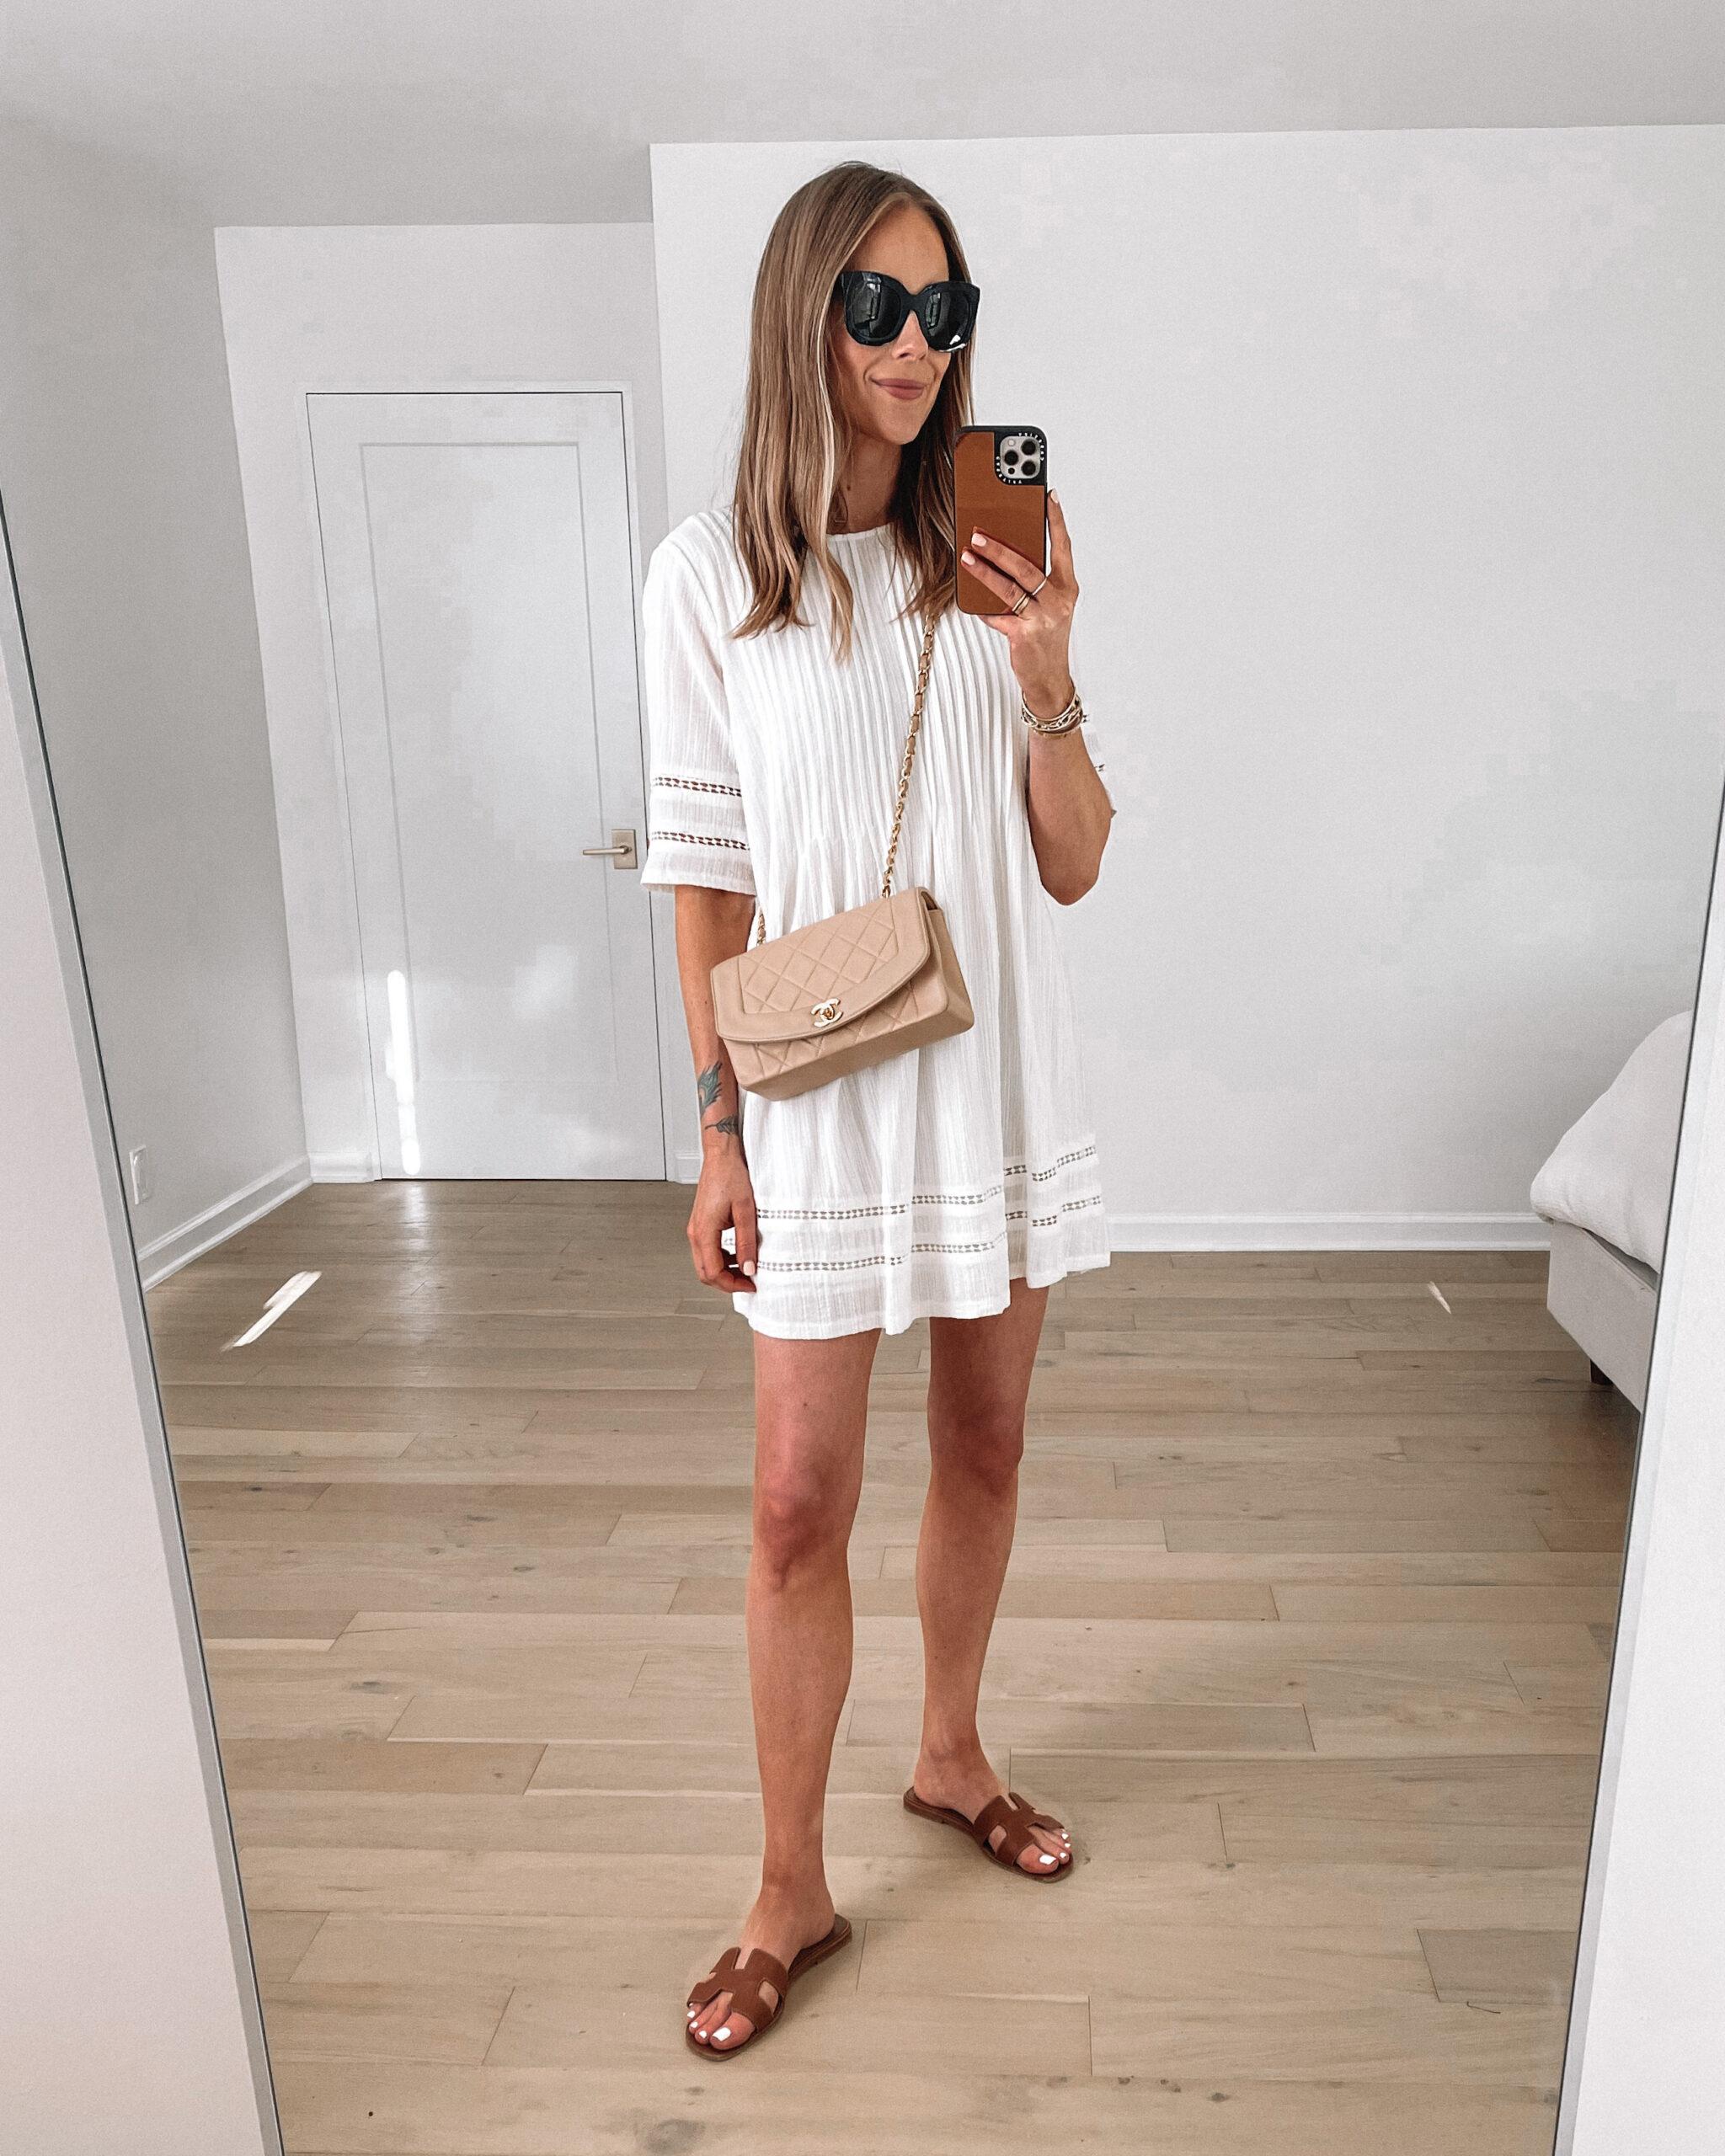 Fashion Jackson Wearing Casual White Dress Brown Hermes Sandals